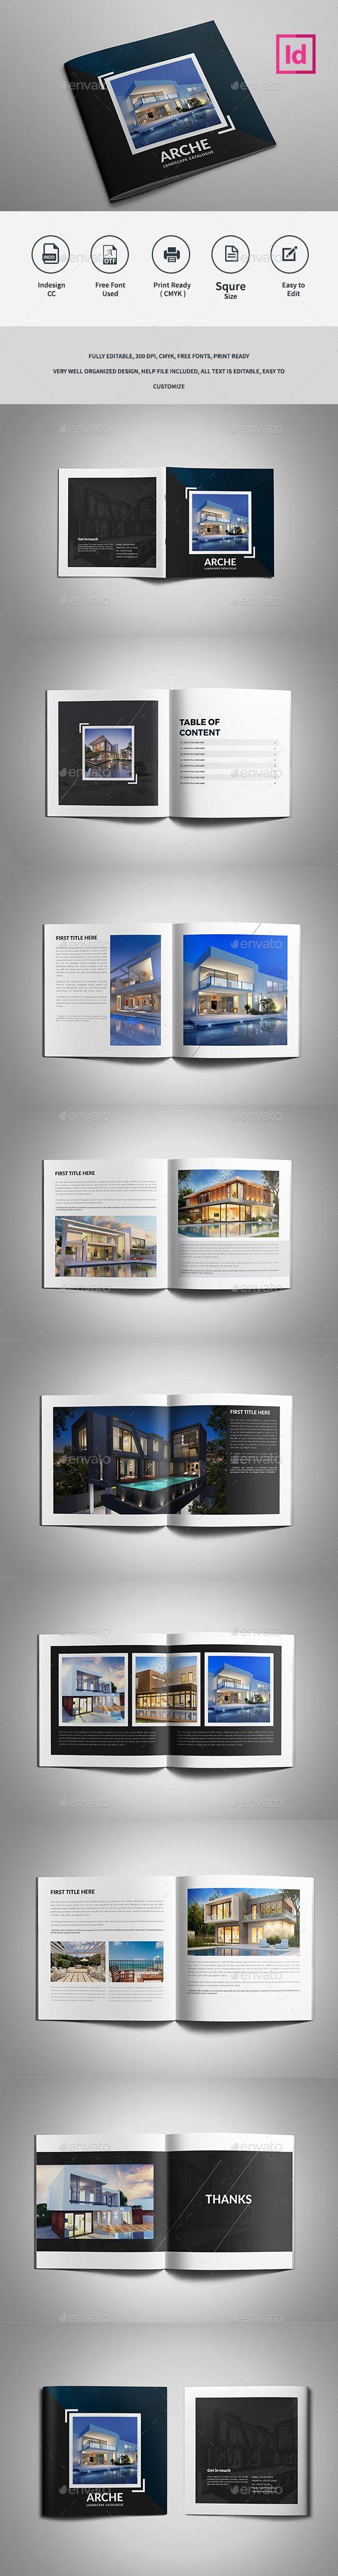 Architecture Catalog Brochure - #Catalogs #Brochures Download here:  https://graphicriver.net/item/architecture-catalog-brochure/19271401?ref=alena994